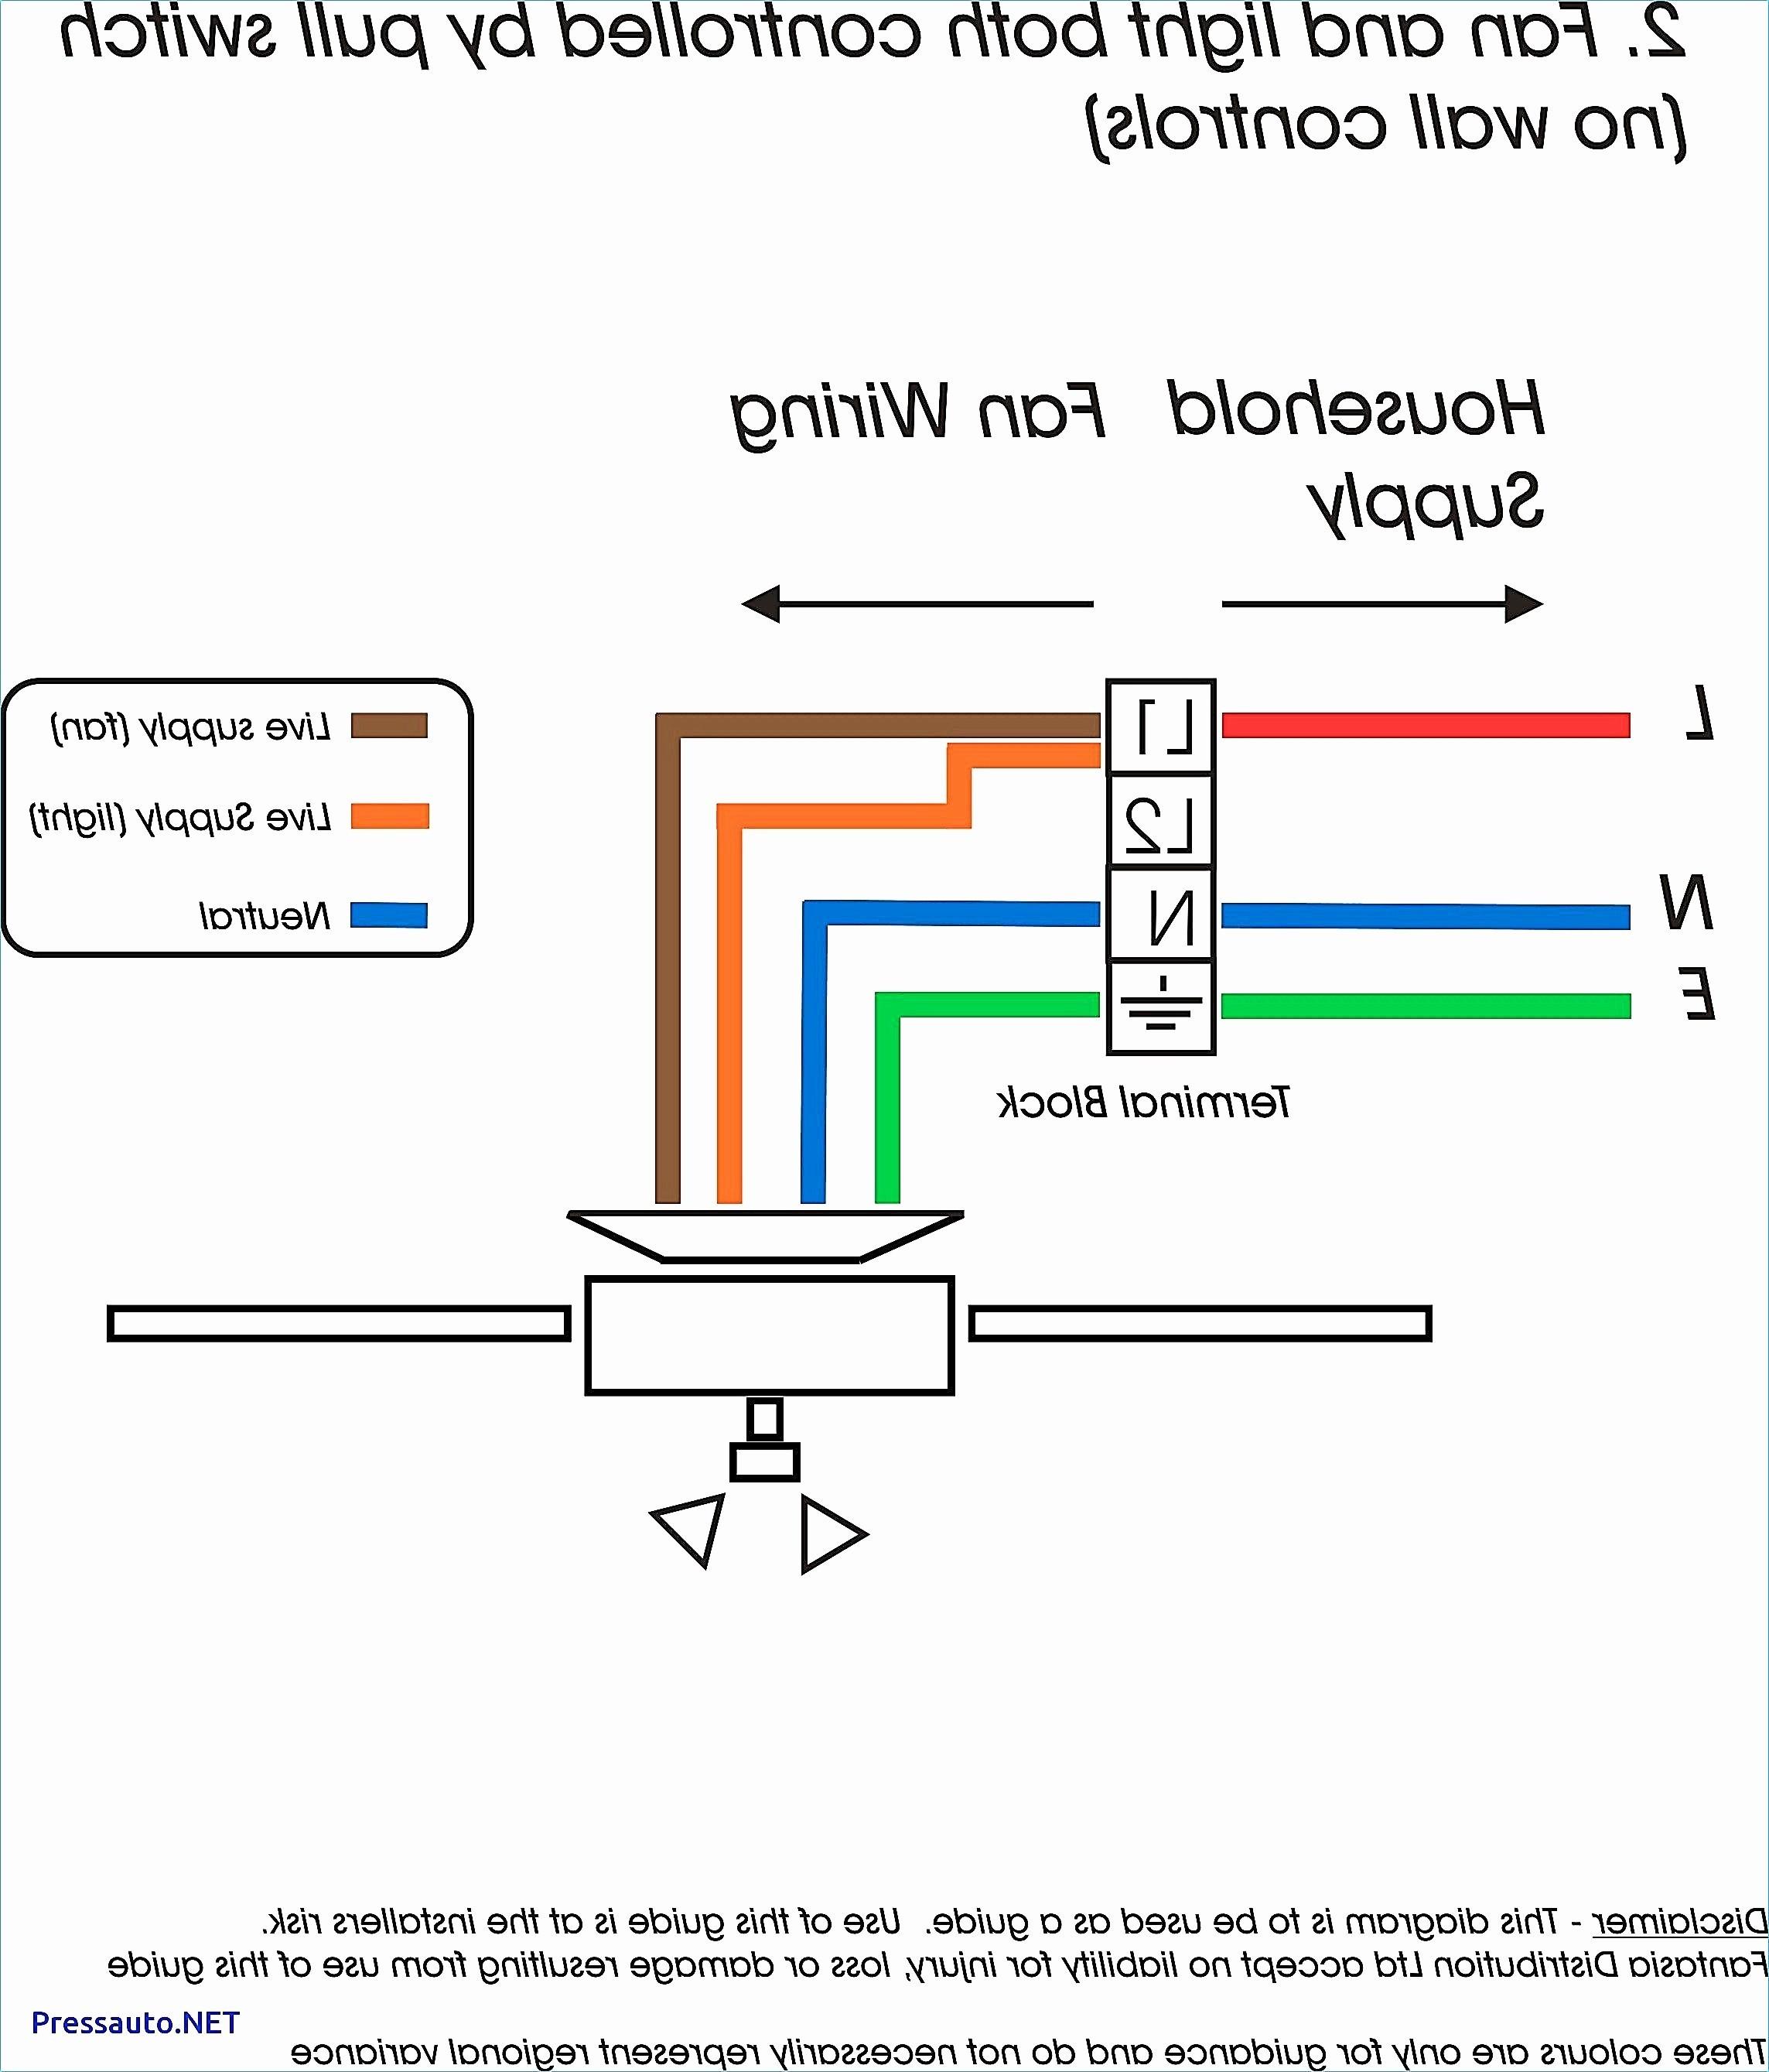 Viper 5706 Wiring Diagram Viper 5901 Wiring Diagram Of Viper 5706 Wiring Diagram